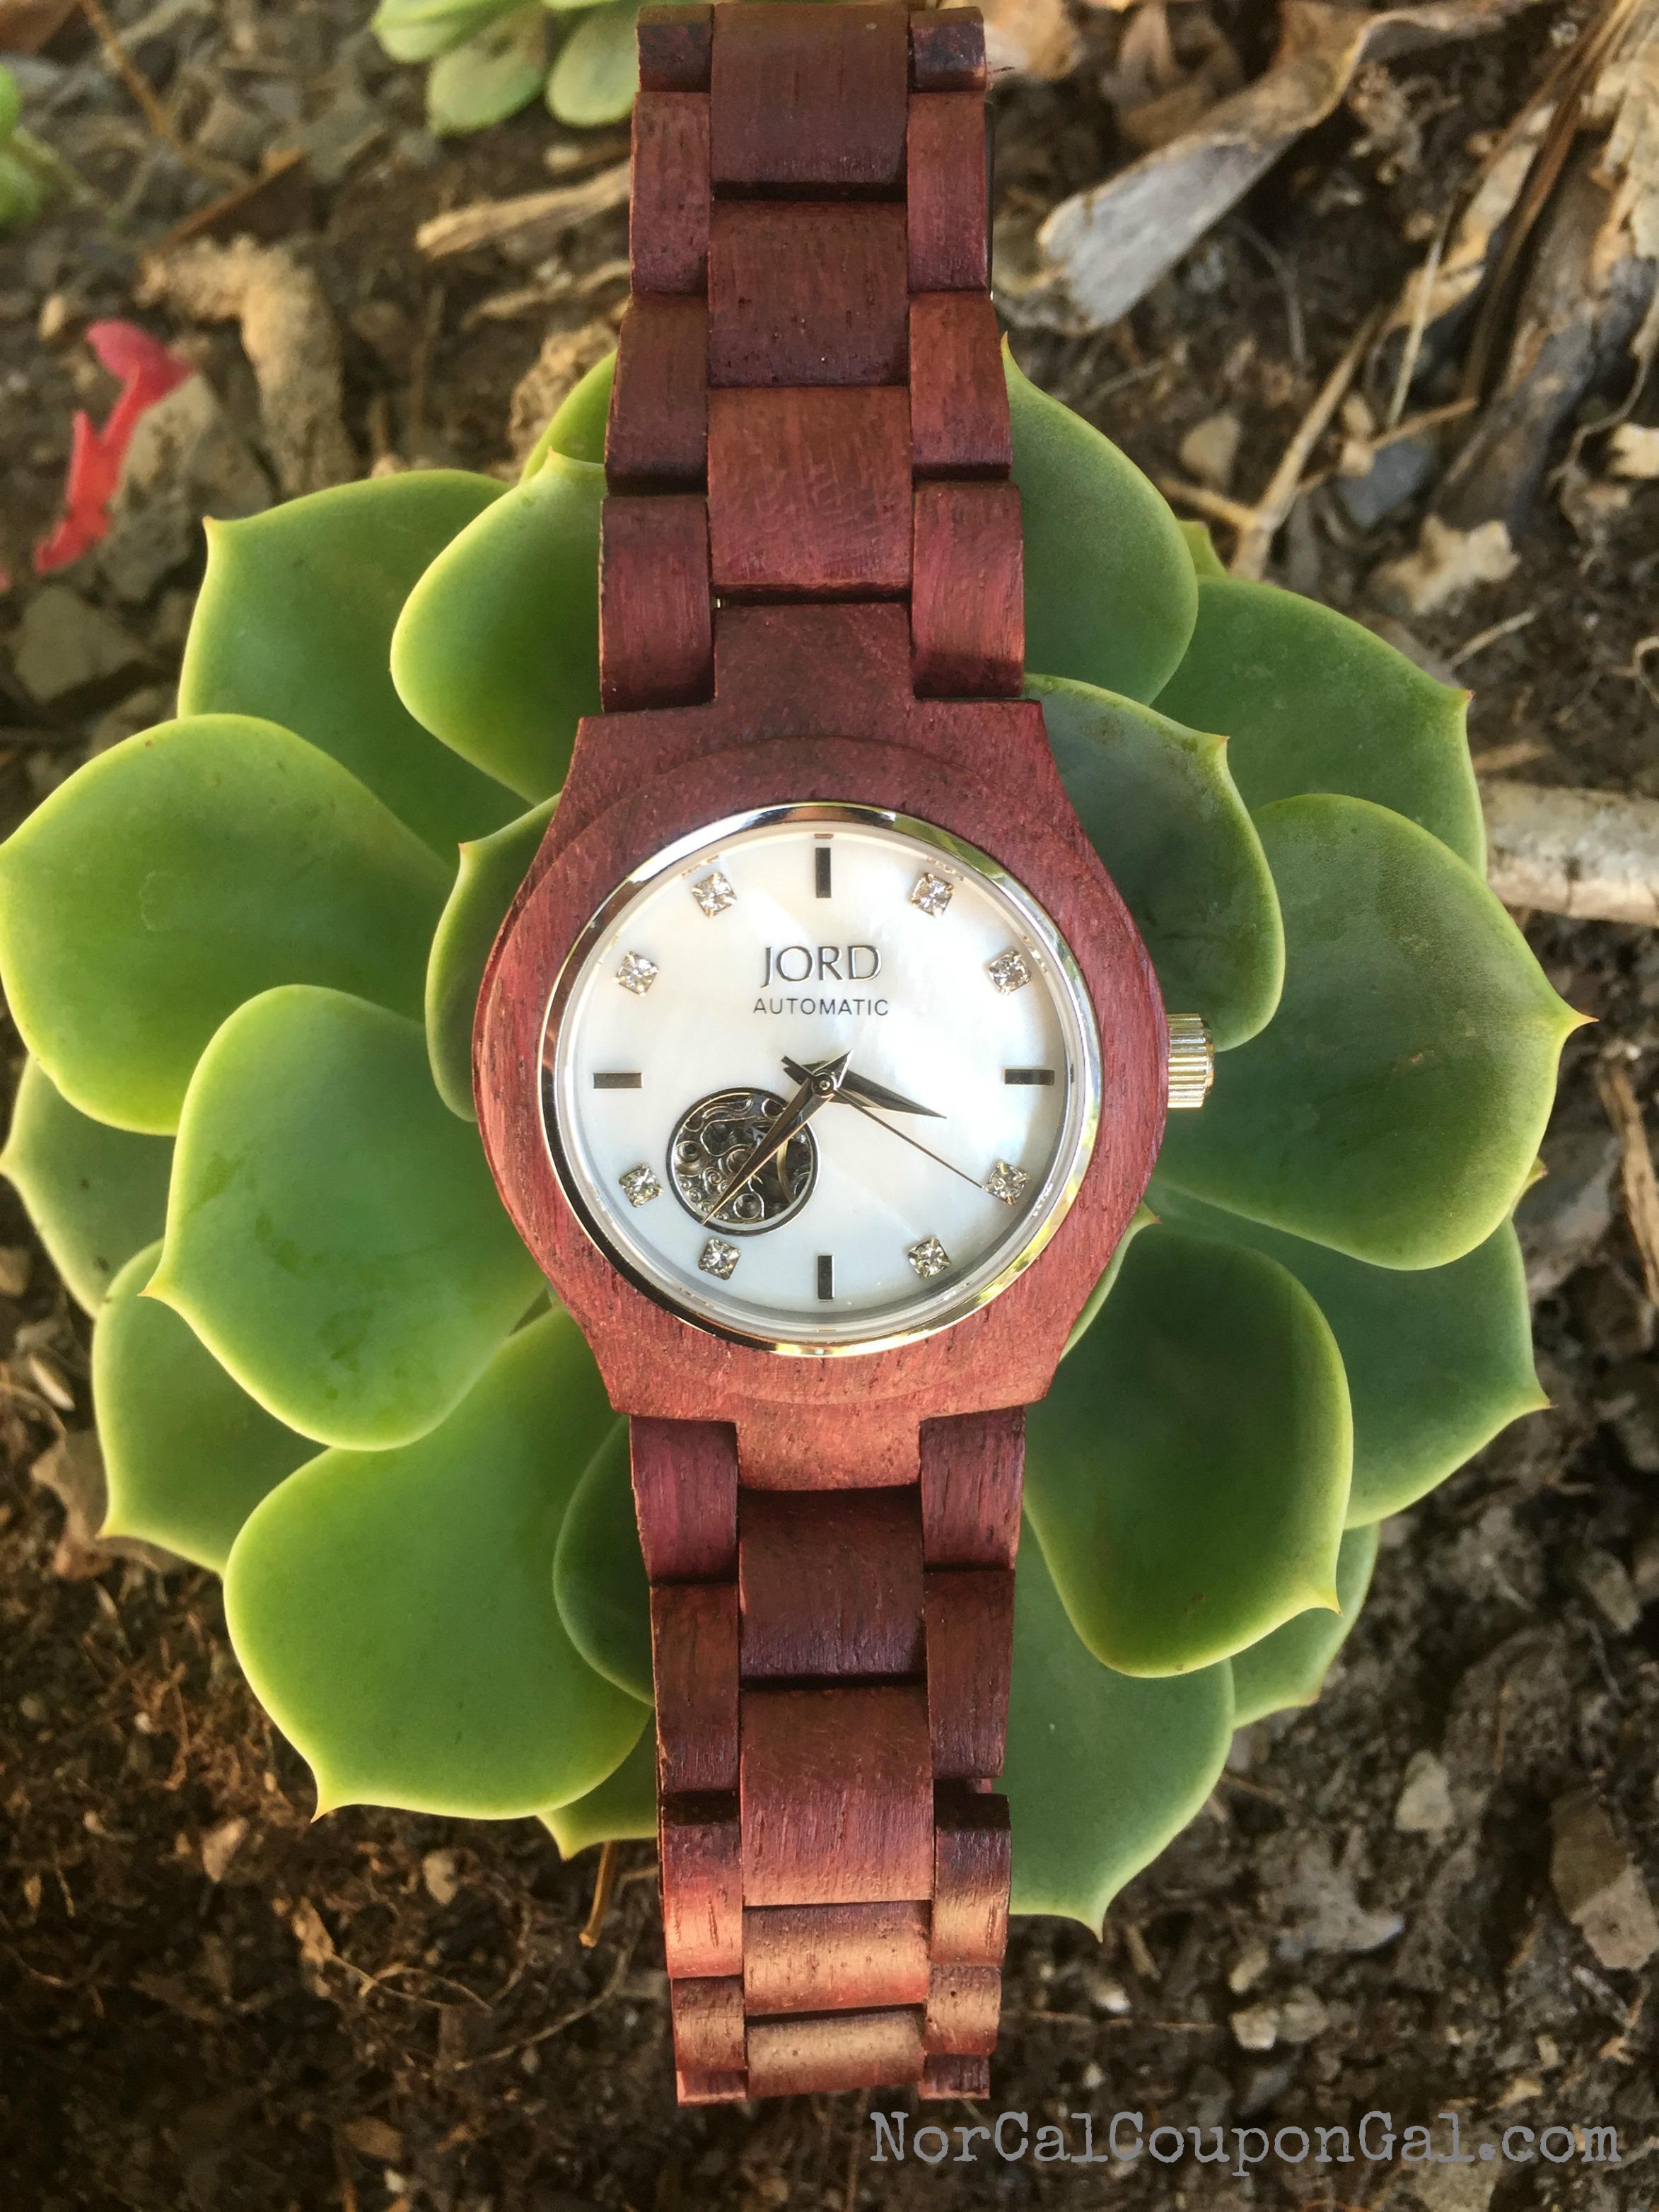 Unique Watches - JORD Wooden Watch